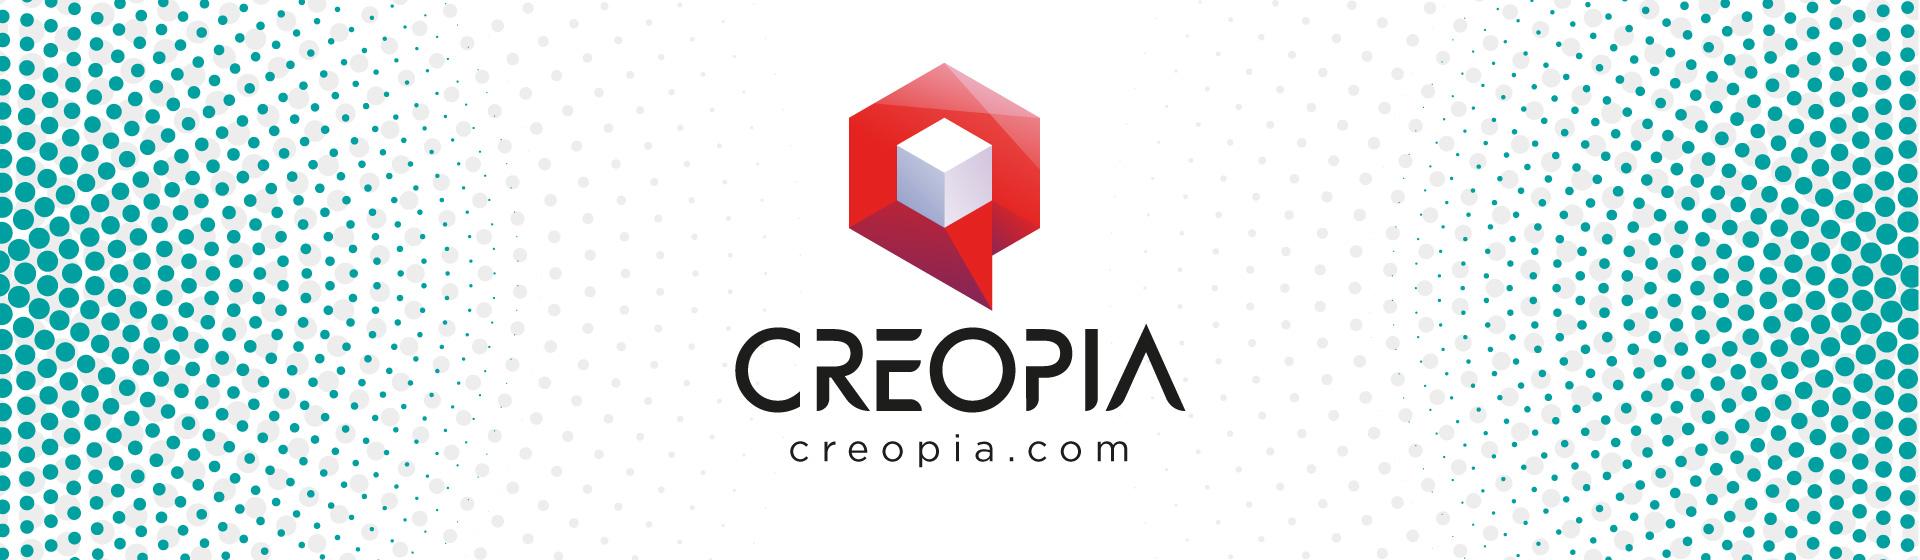 Creopia - Brand Design by Brandizle